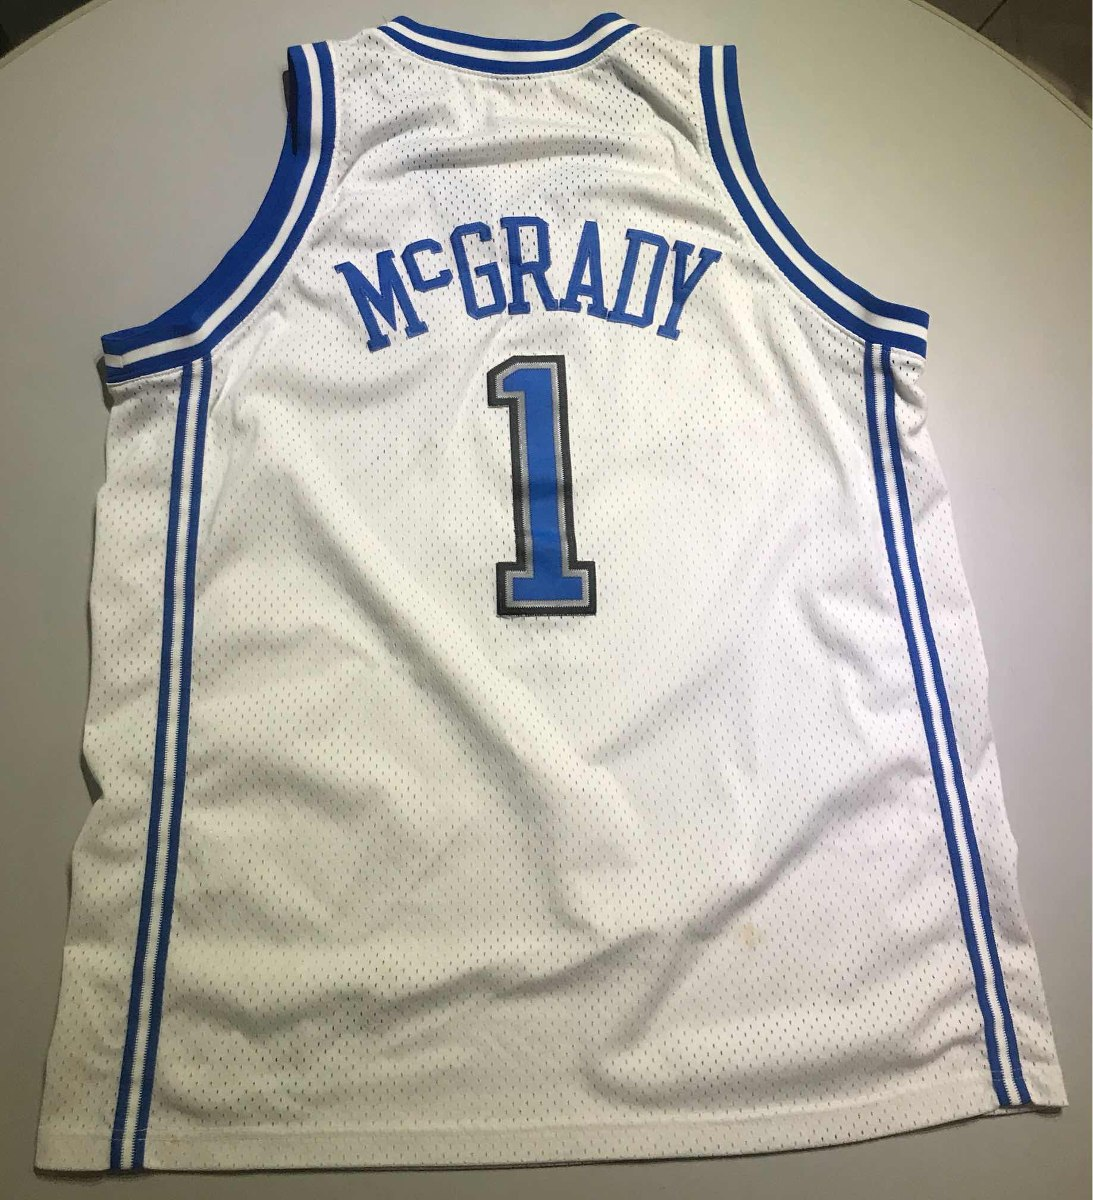 competitive price 6cc02 b2154 Jersey Nba Orlando Magic Mcgrady Xl 18 - $ 450.00